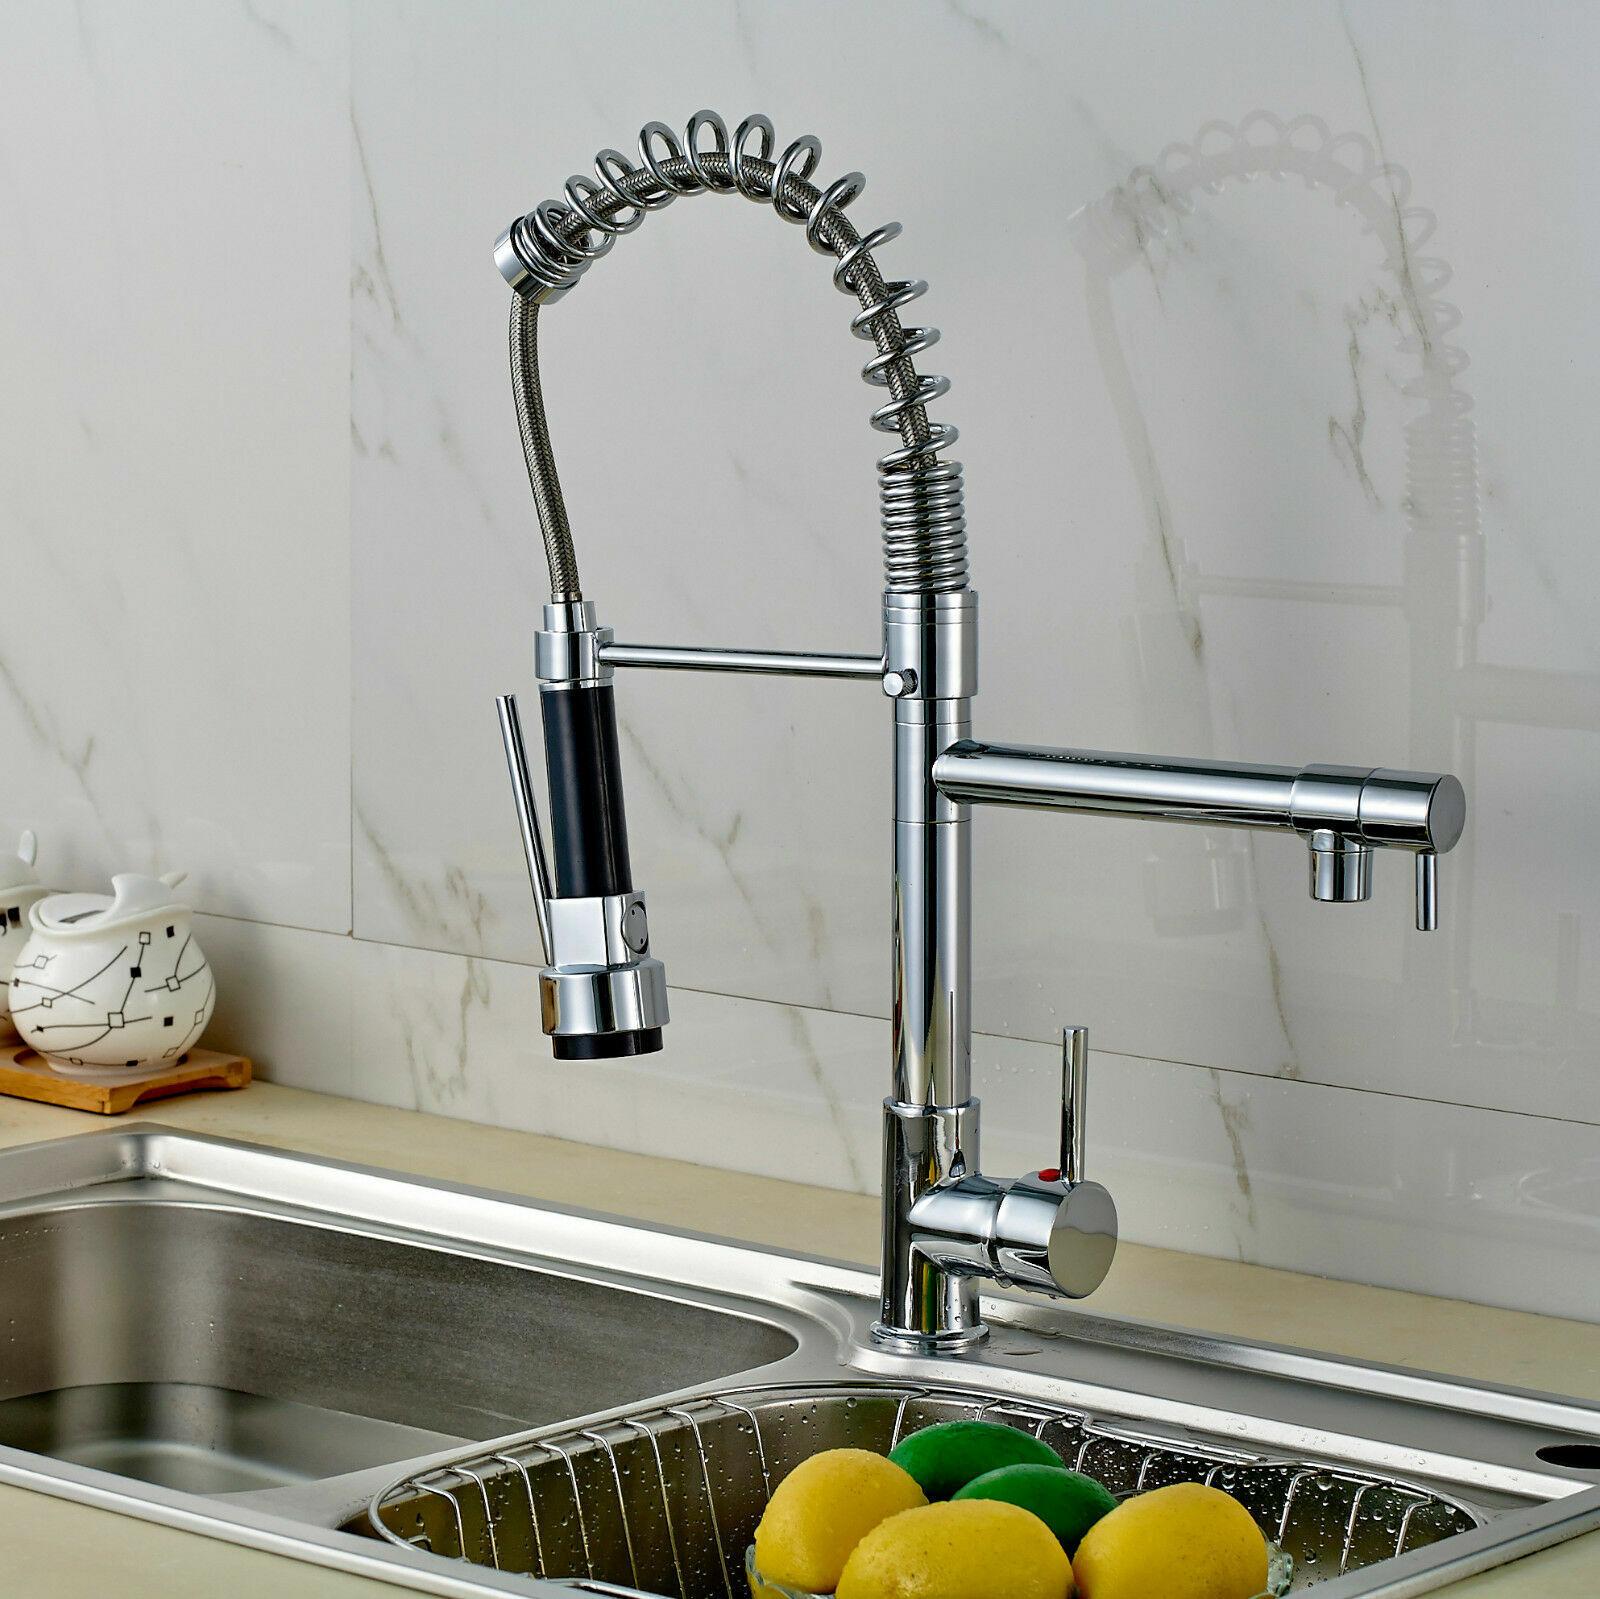 Member S Mark Commercial Kitchen Faucet Fp4a0071bn For Sale Online Ebay